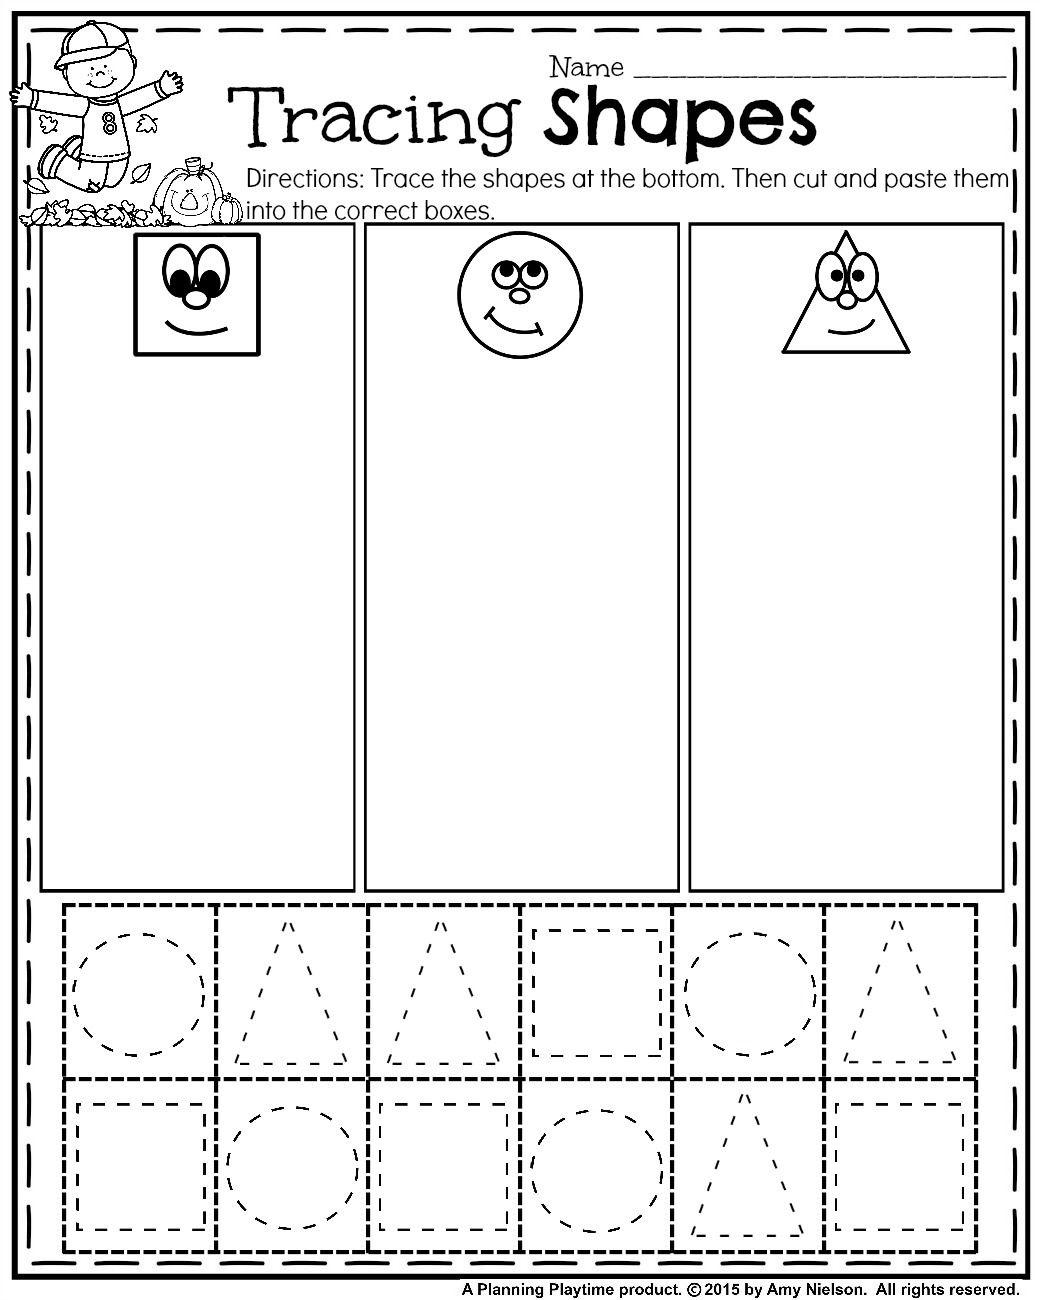 October Preschool Worksheets | Sheets | Preschool Worksheets, Shape - Free Printable Kindergarten Worksheets Cut And Paste